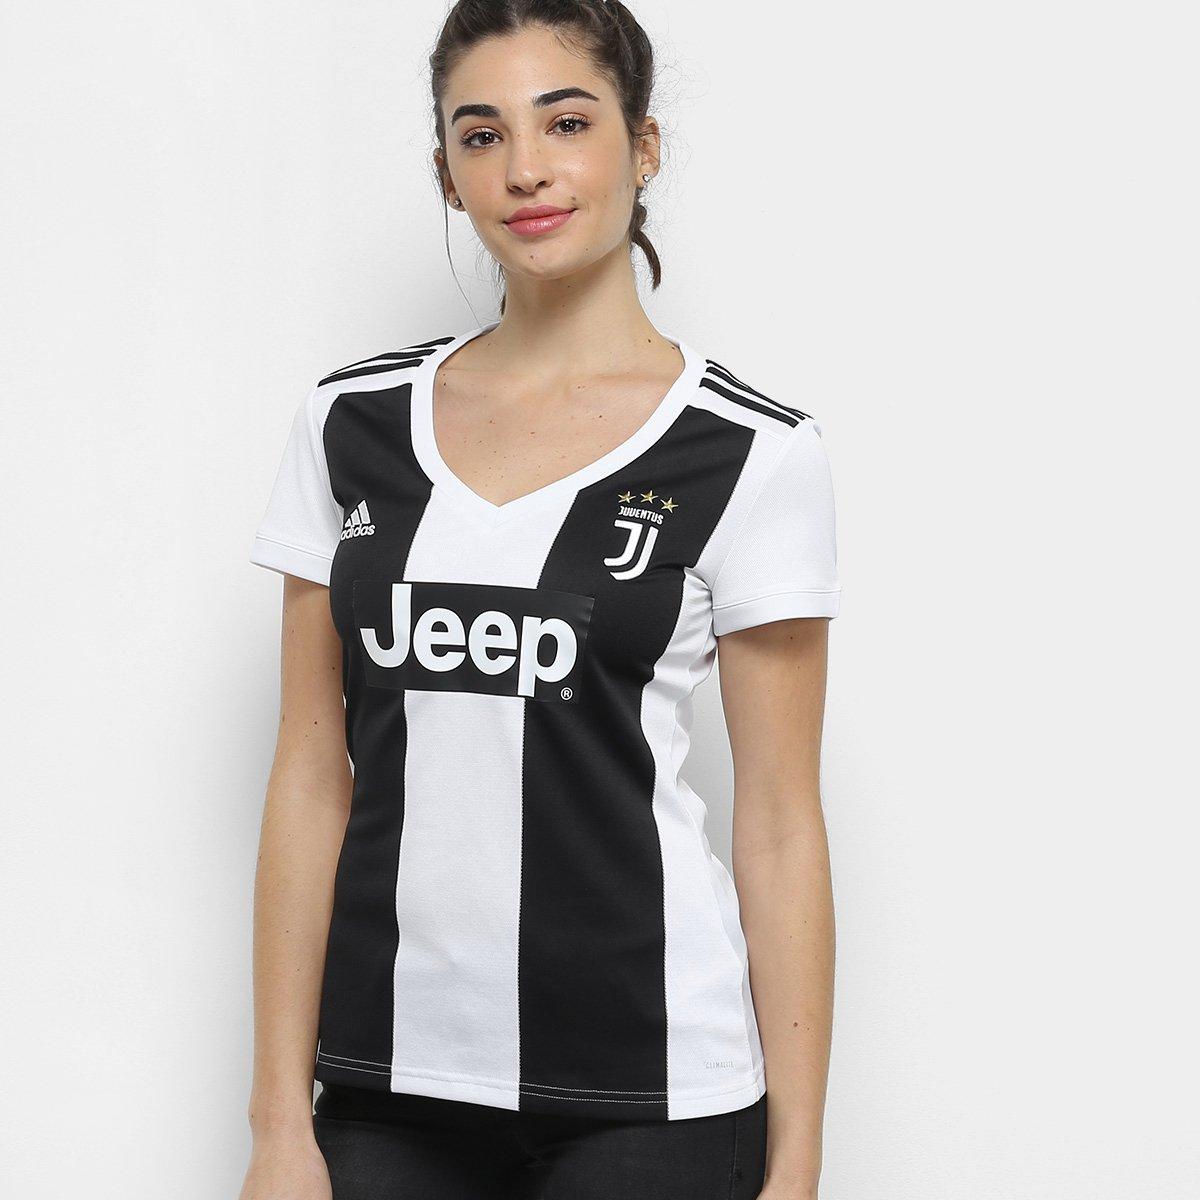 e75de1d741 Camisa Juventus Home 2018 s n° - Torcedor Adidas Feminina